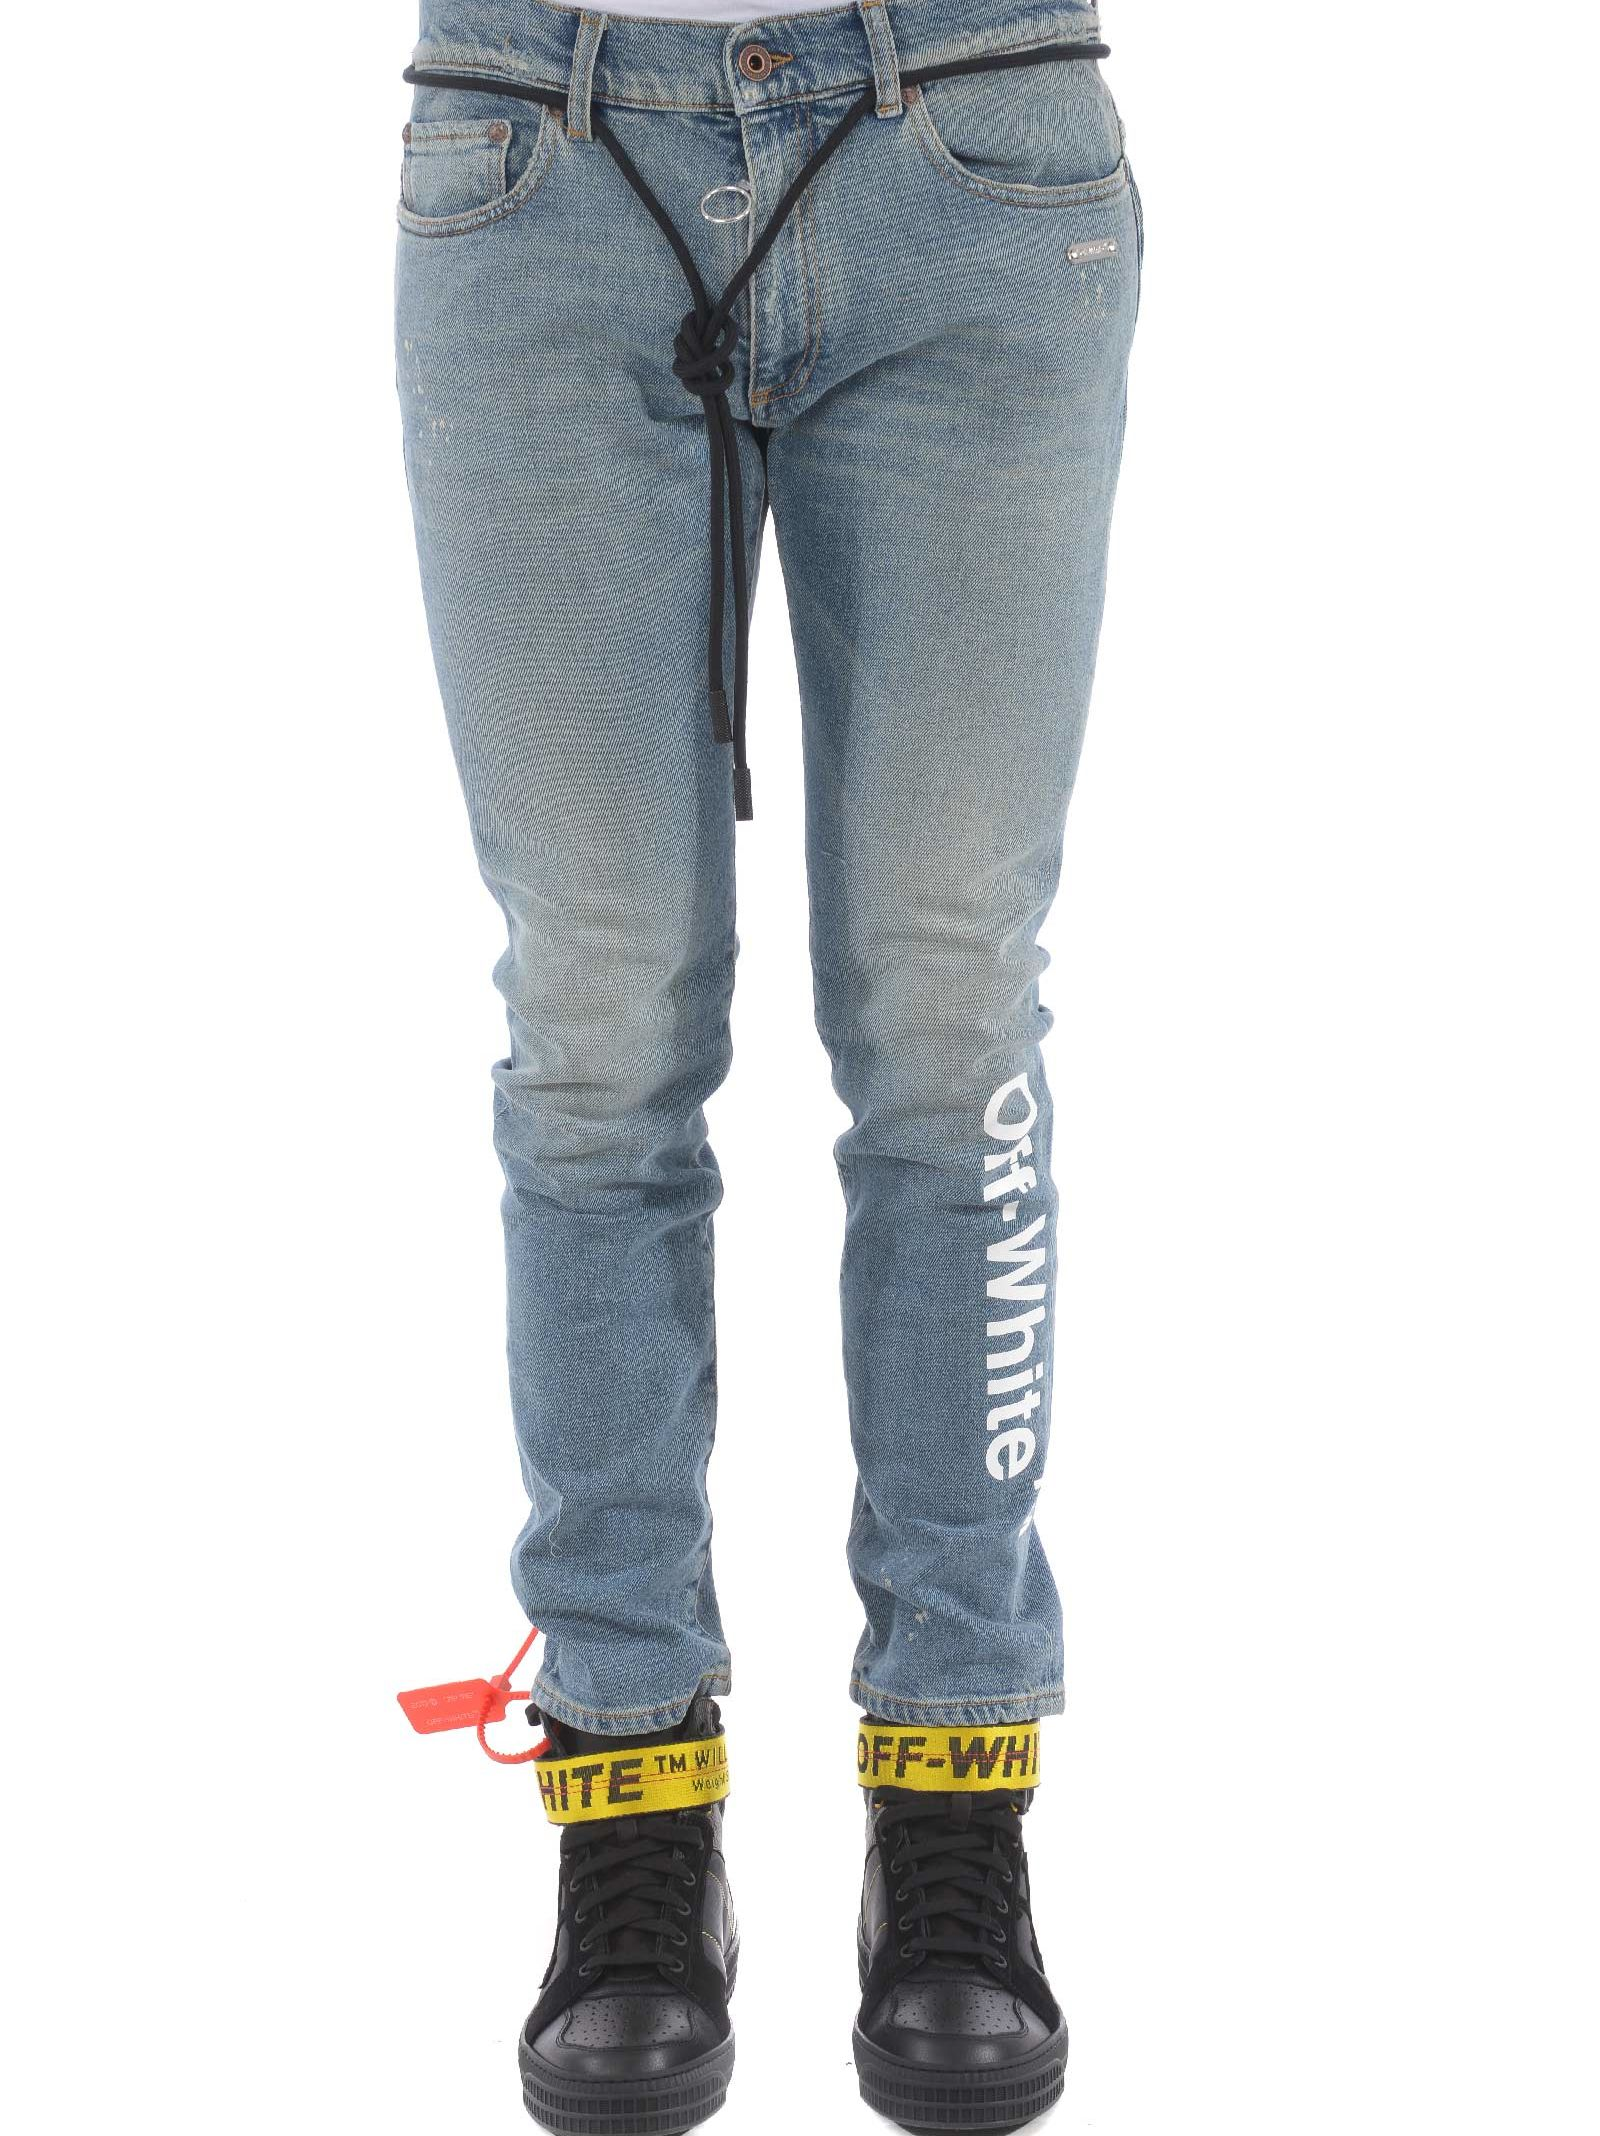 Off-white Skinny Vintage Jeans